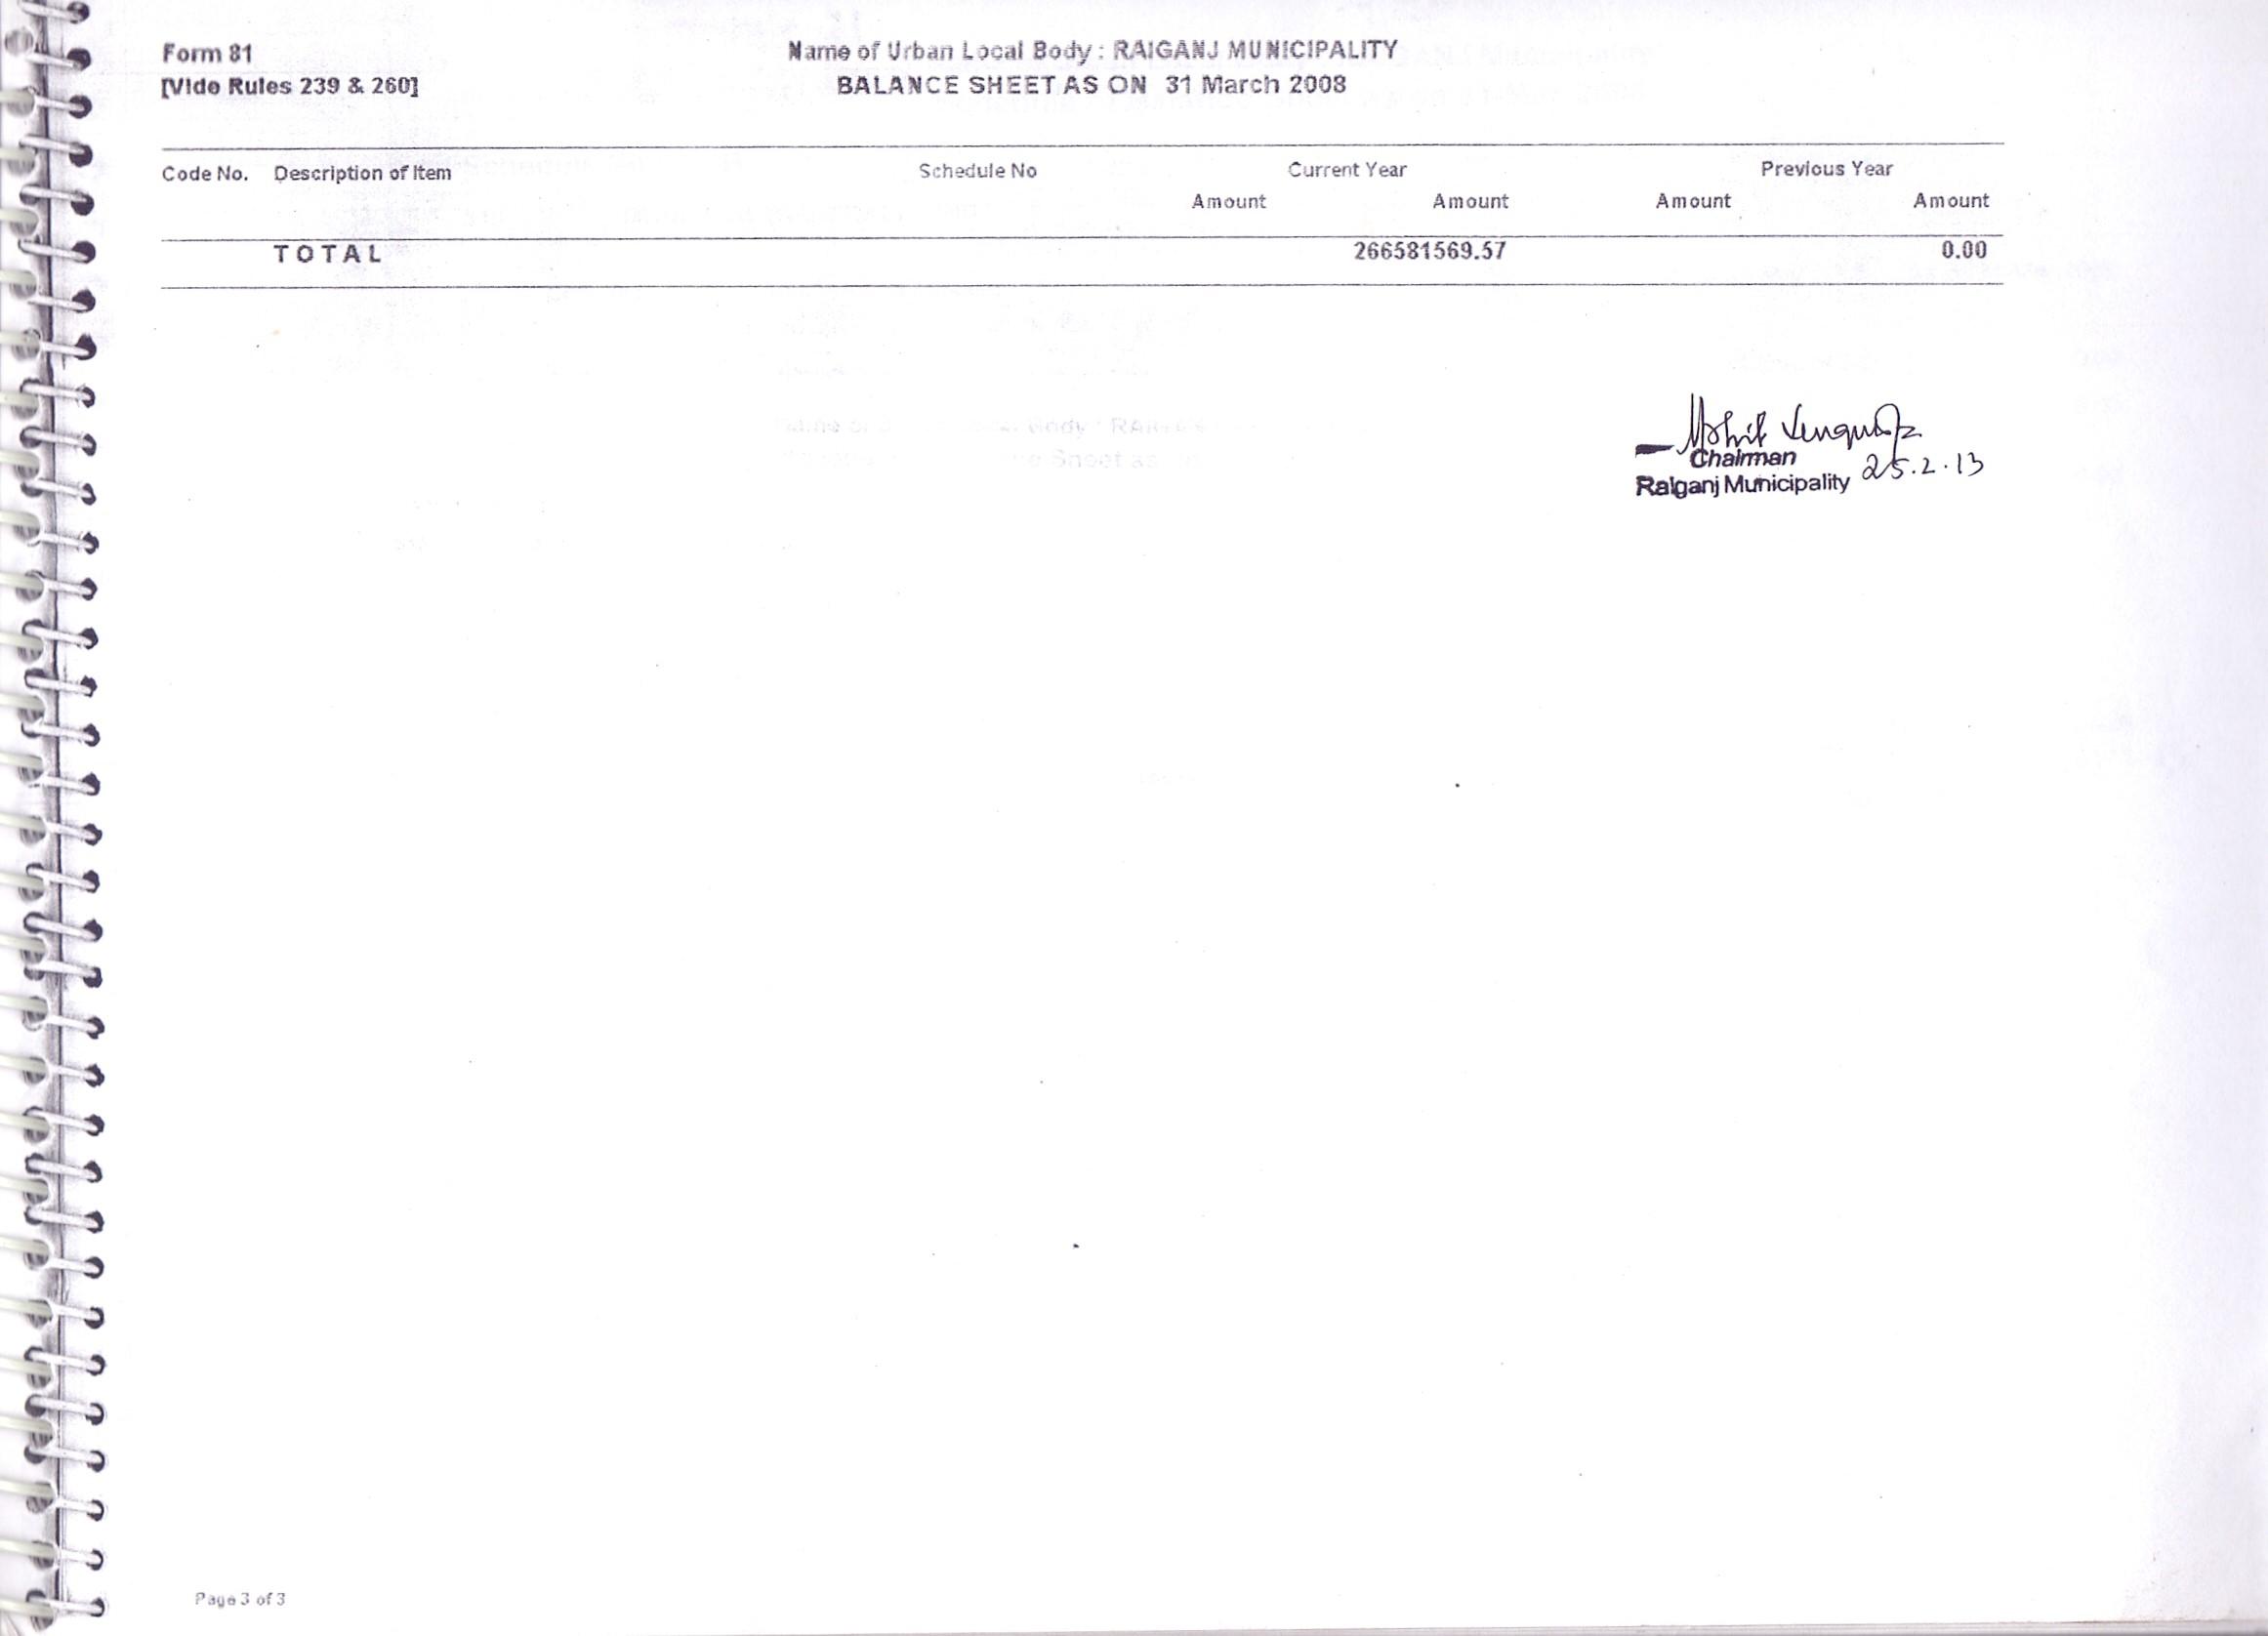 2007-08-balance-sheet-pg-3